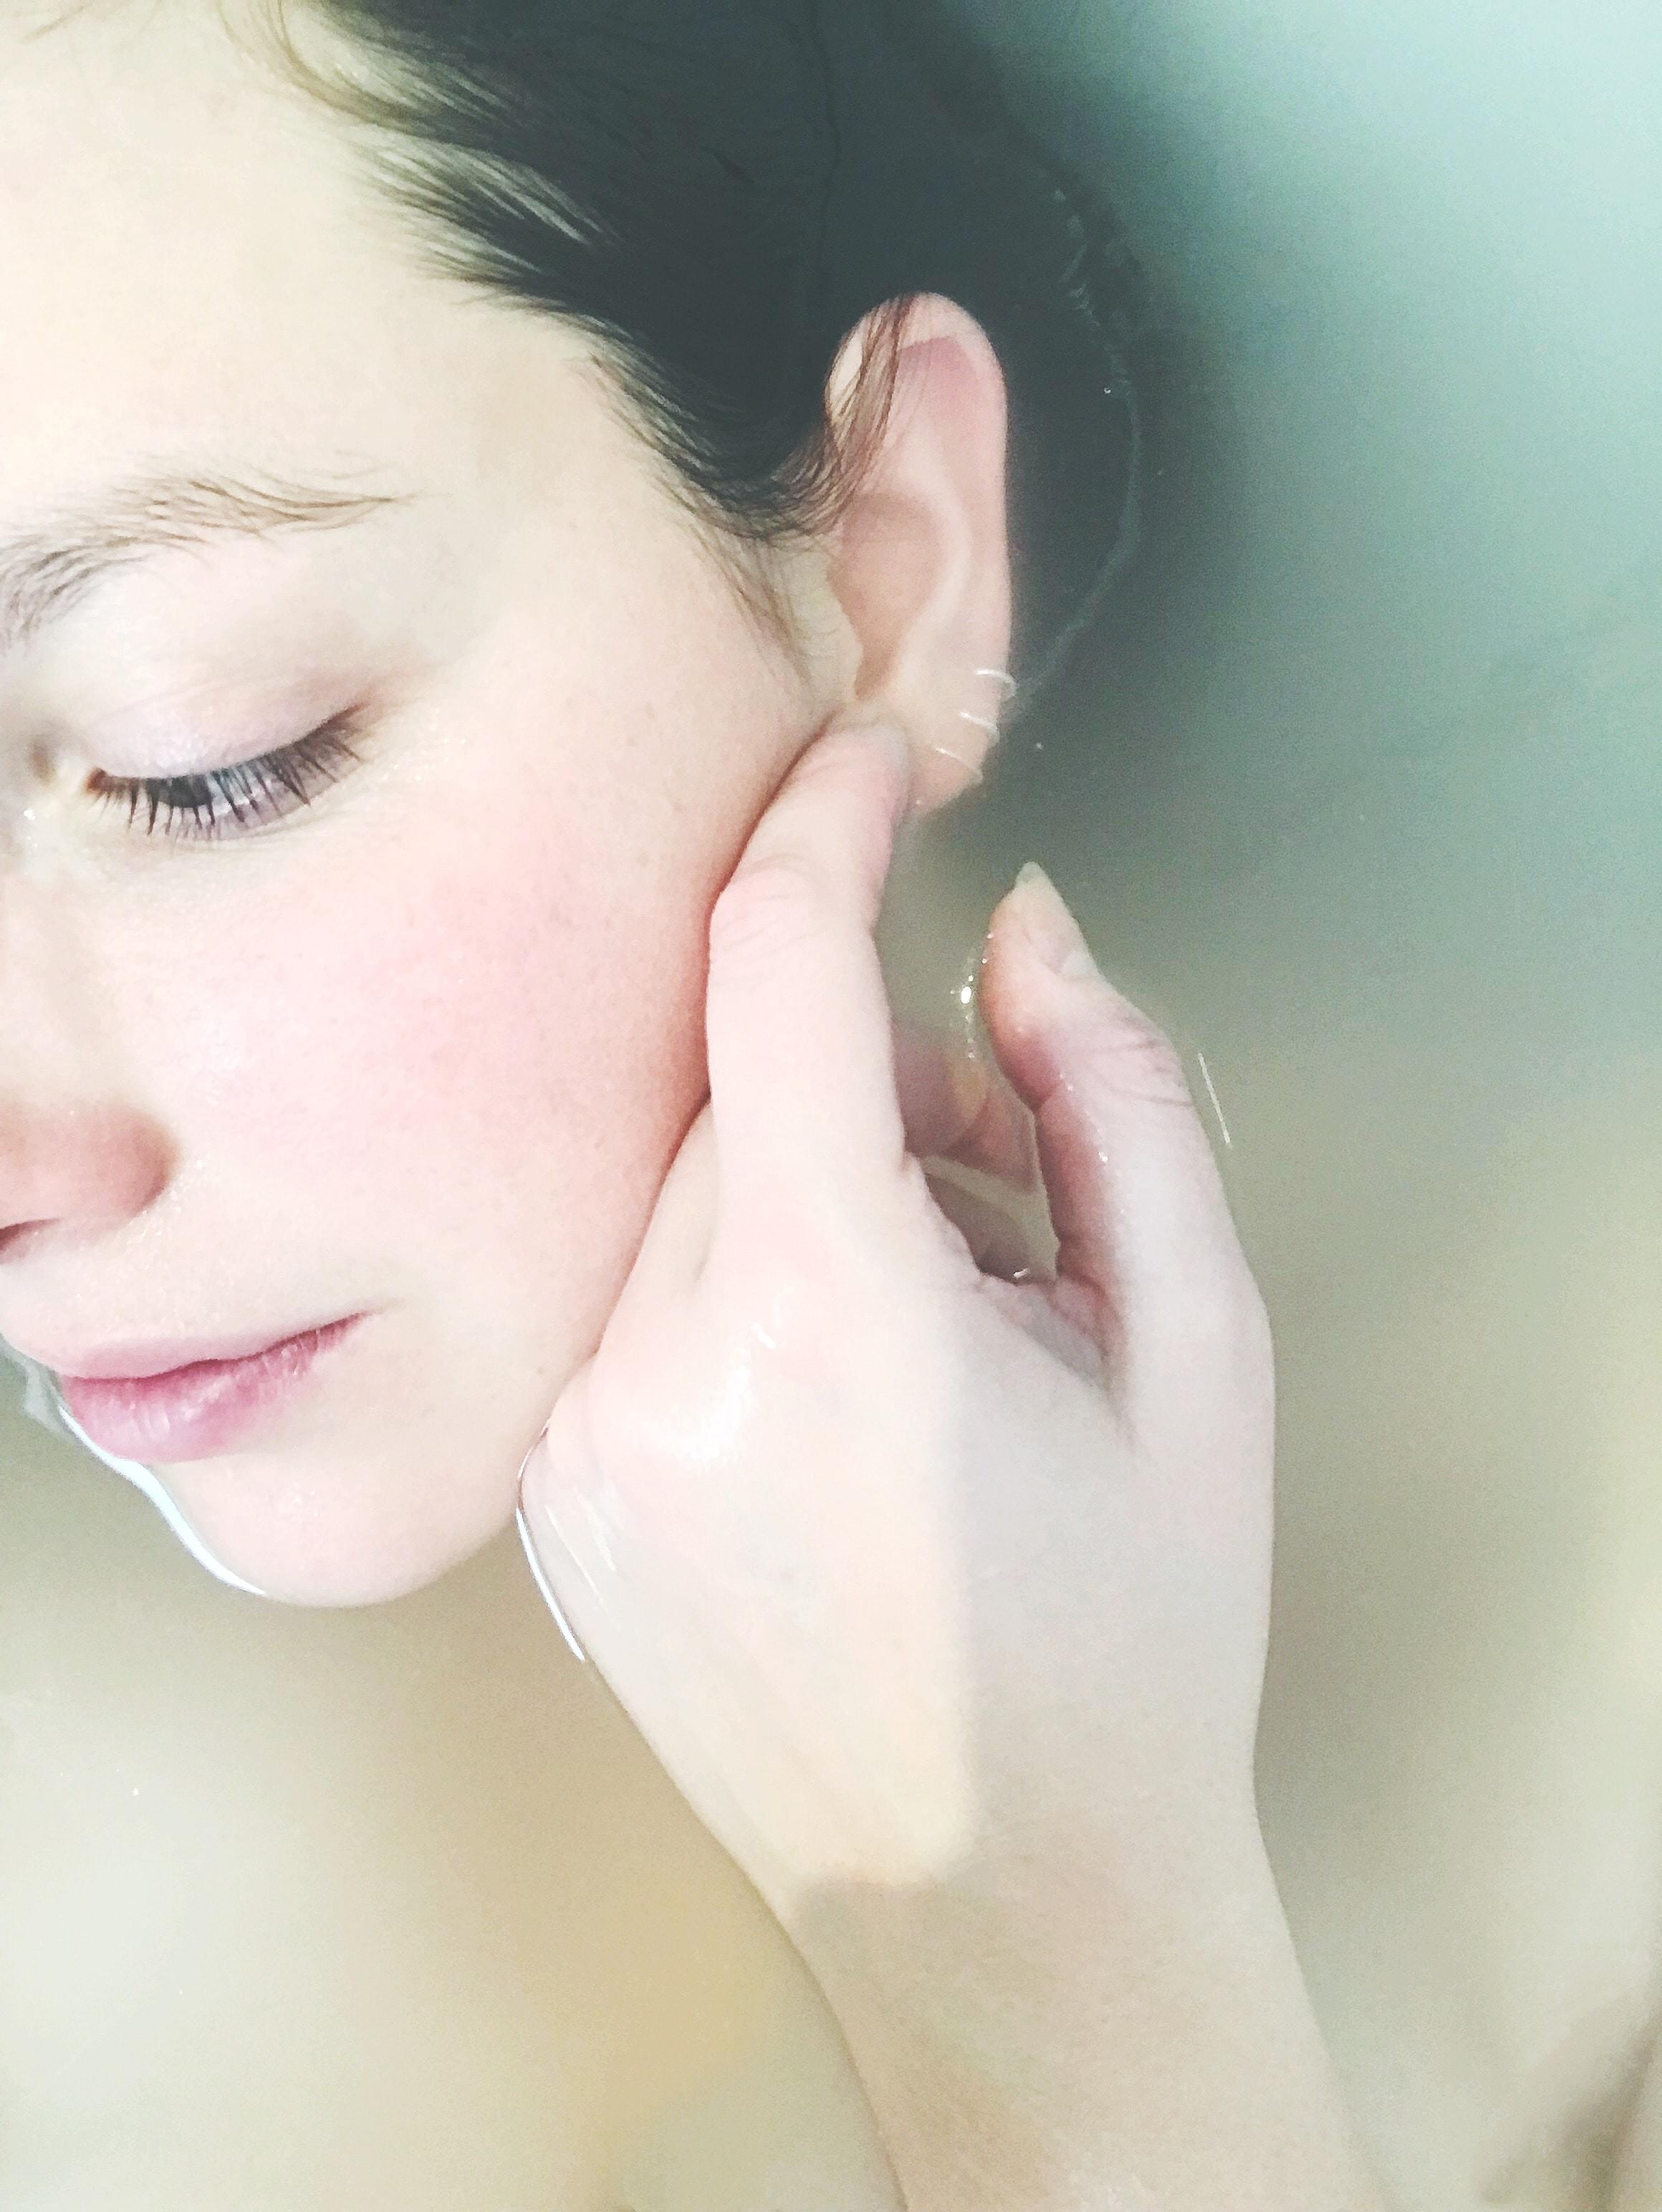 Beauty care: Hydration